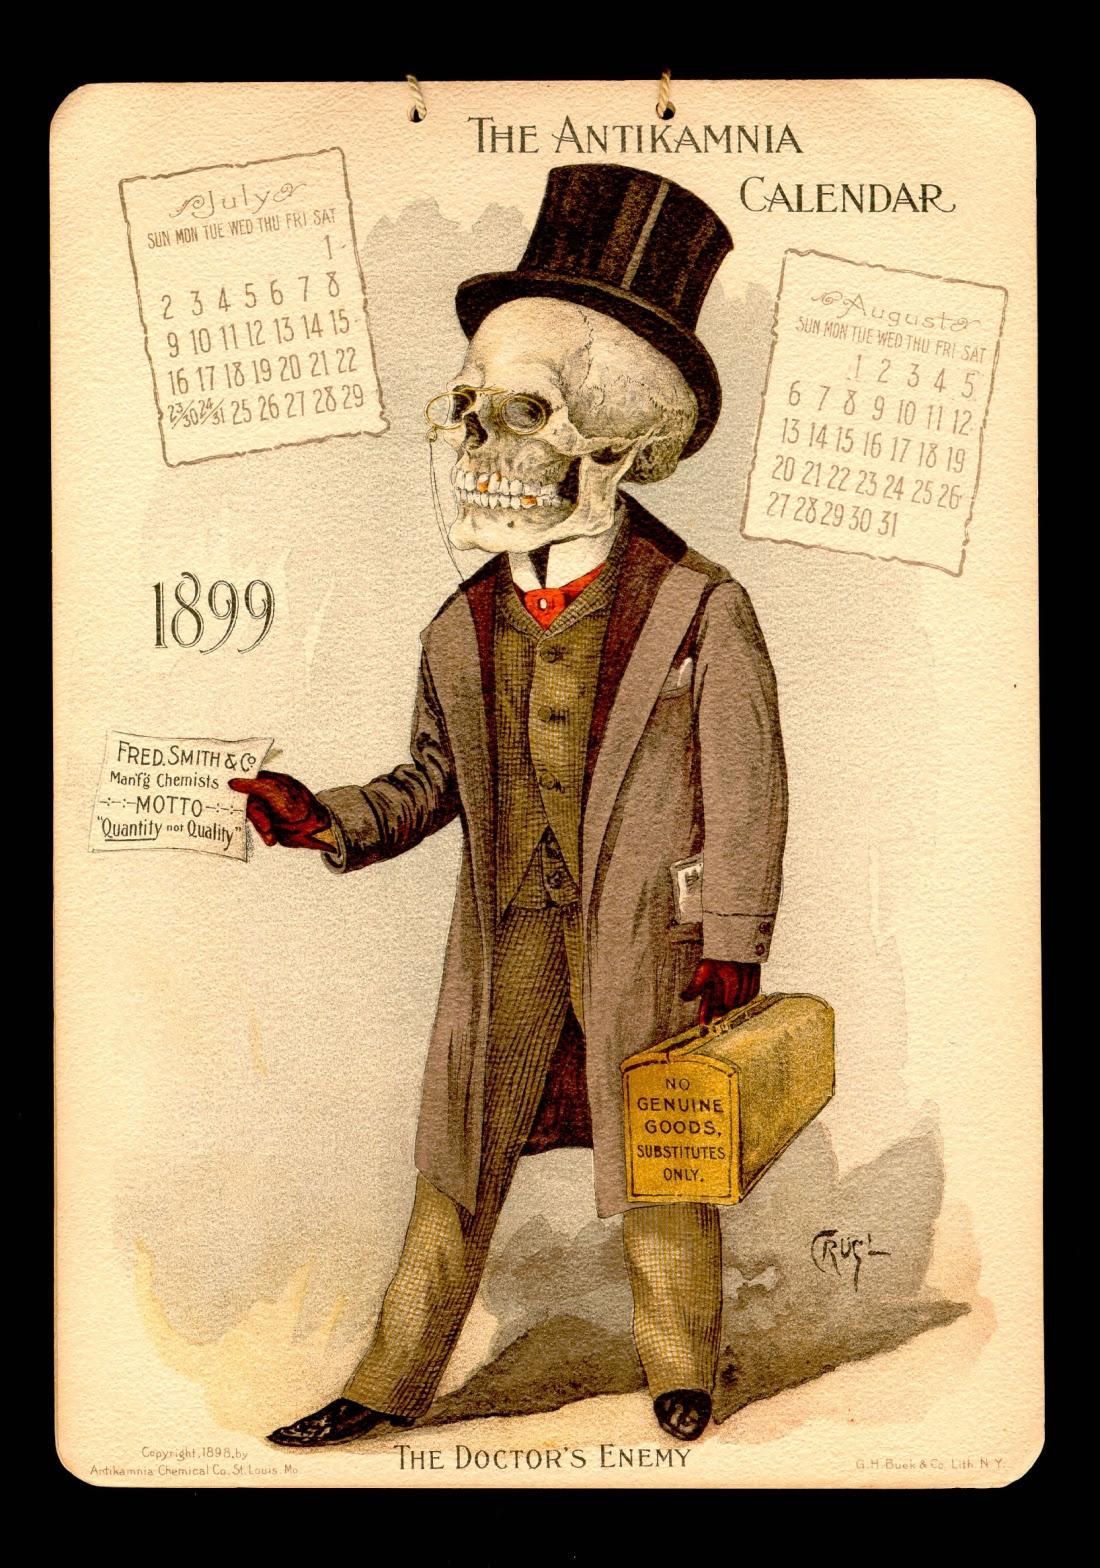 1899 antikamnia medical calendar